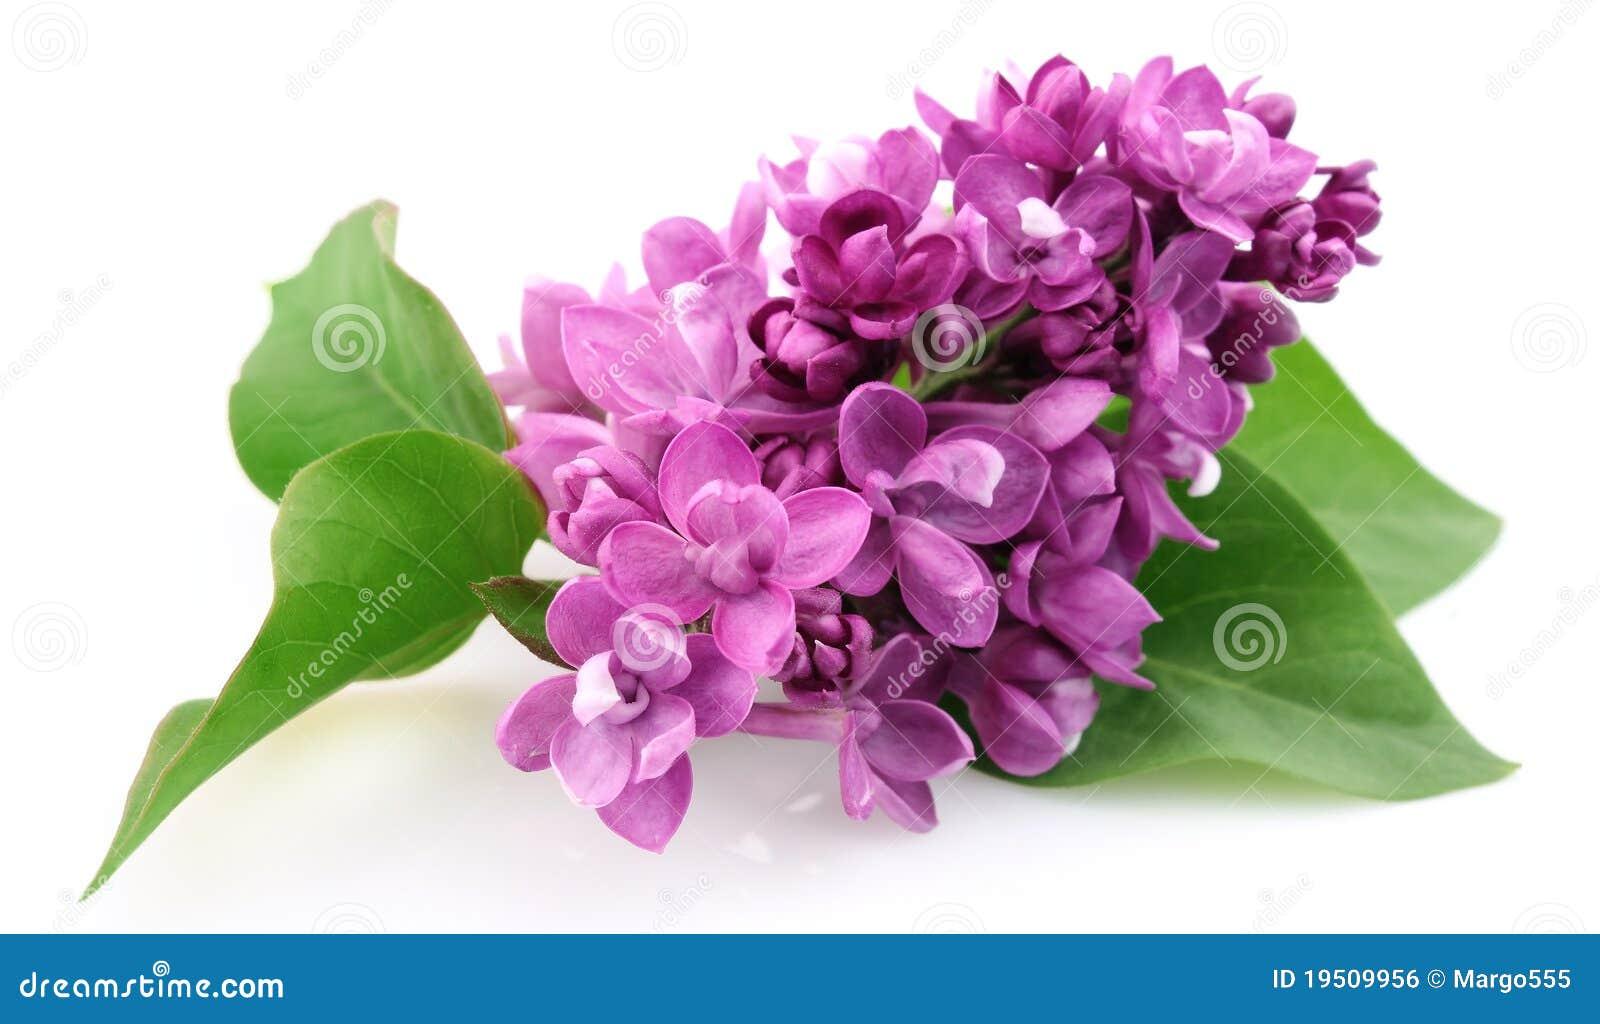 весна сирени цветка